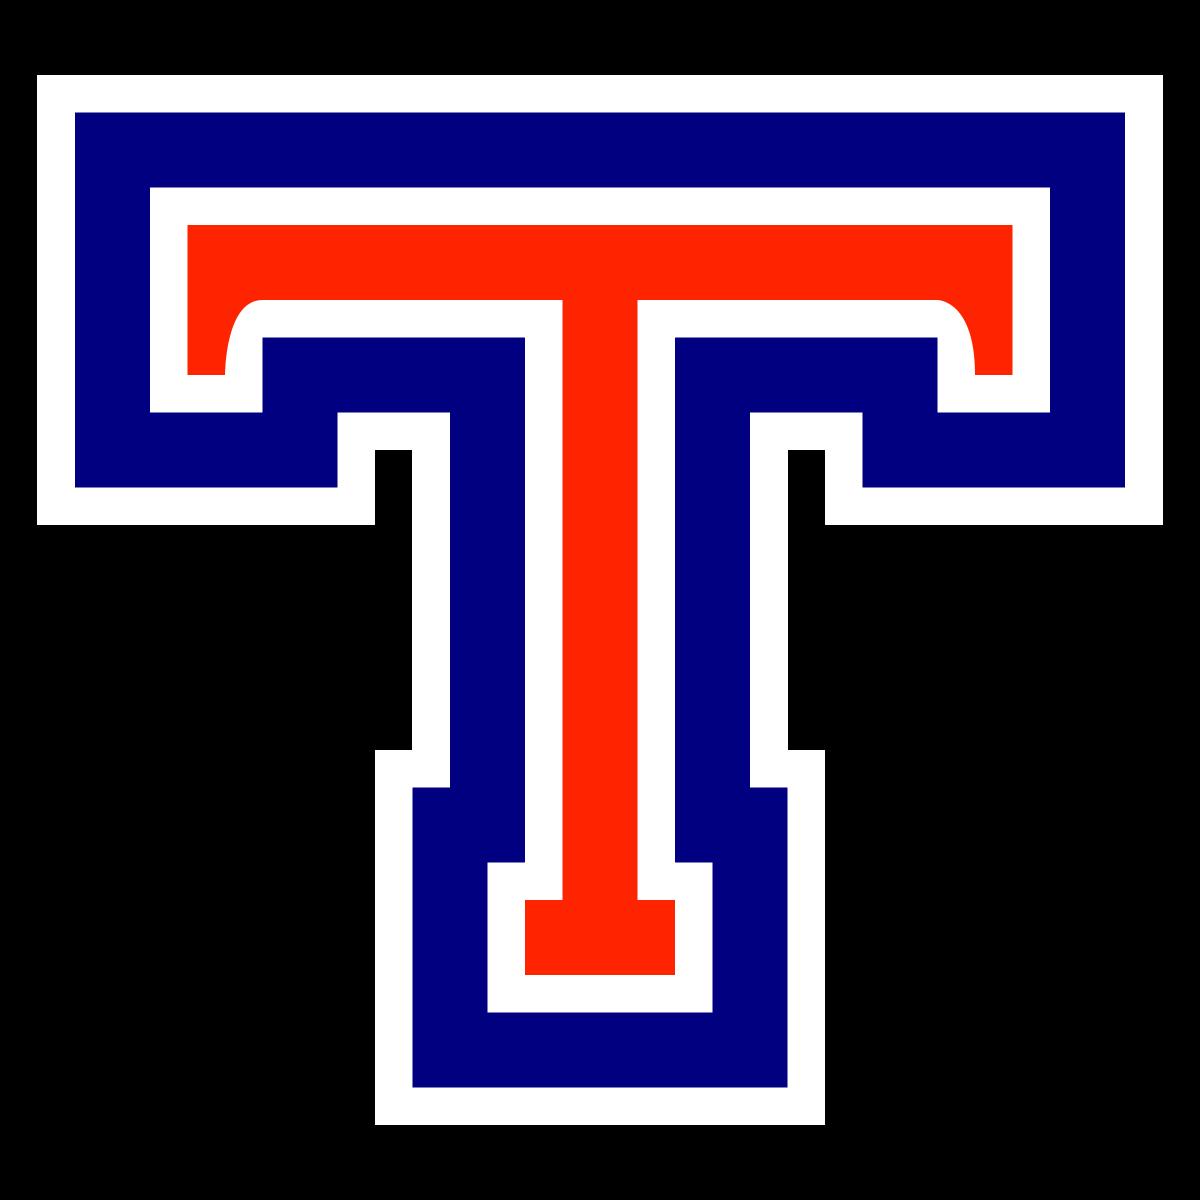 High school football logos.